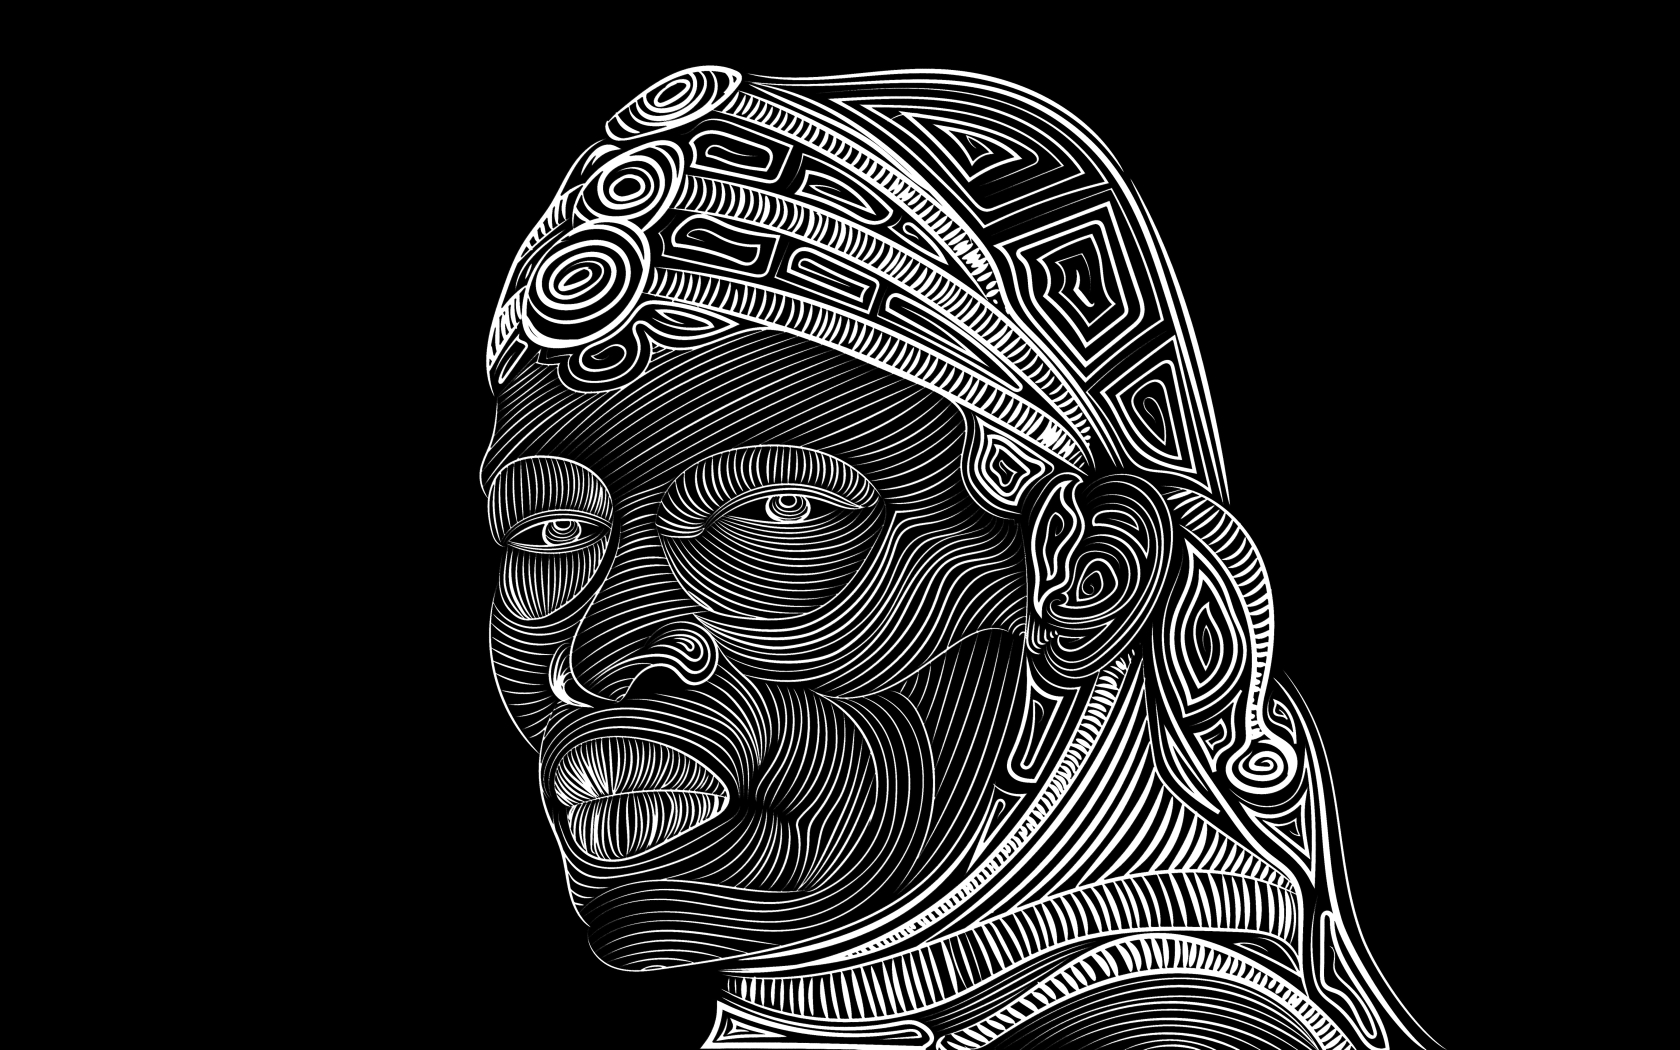 Line Art Download : Line vector art face drawing hd k wallpaper